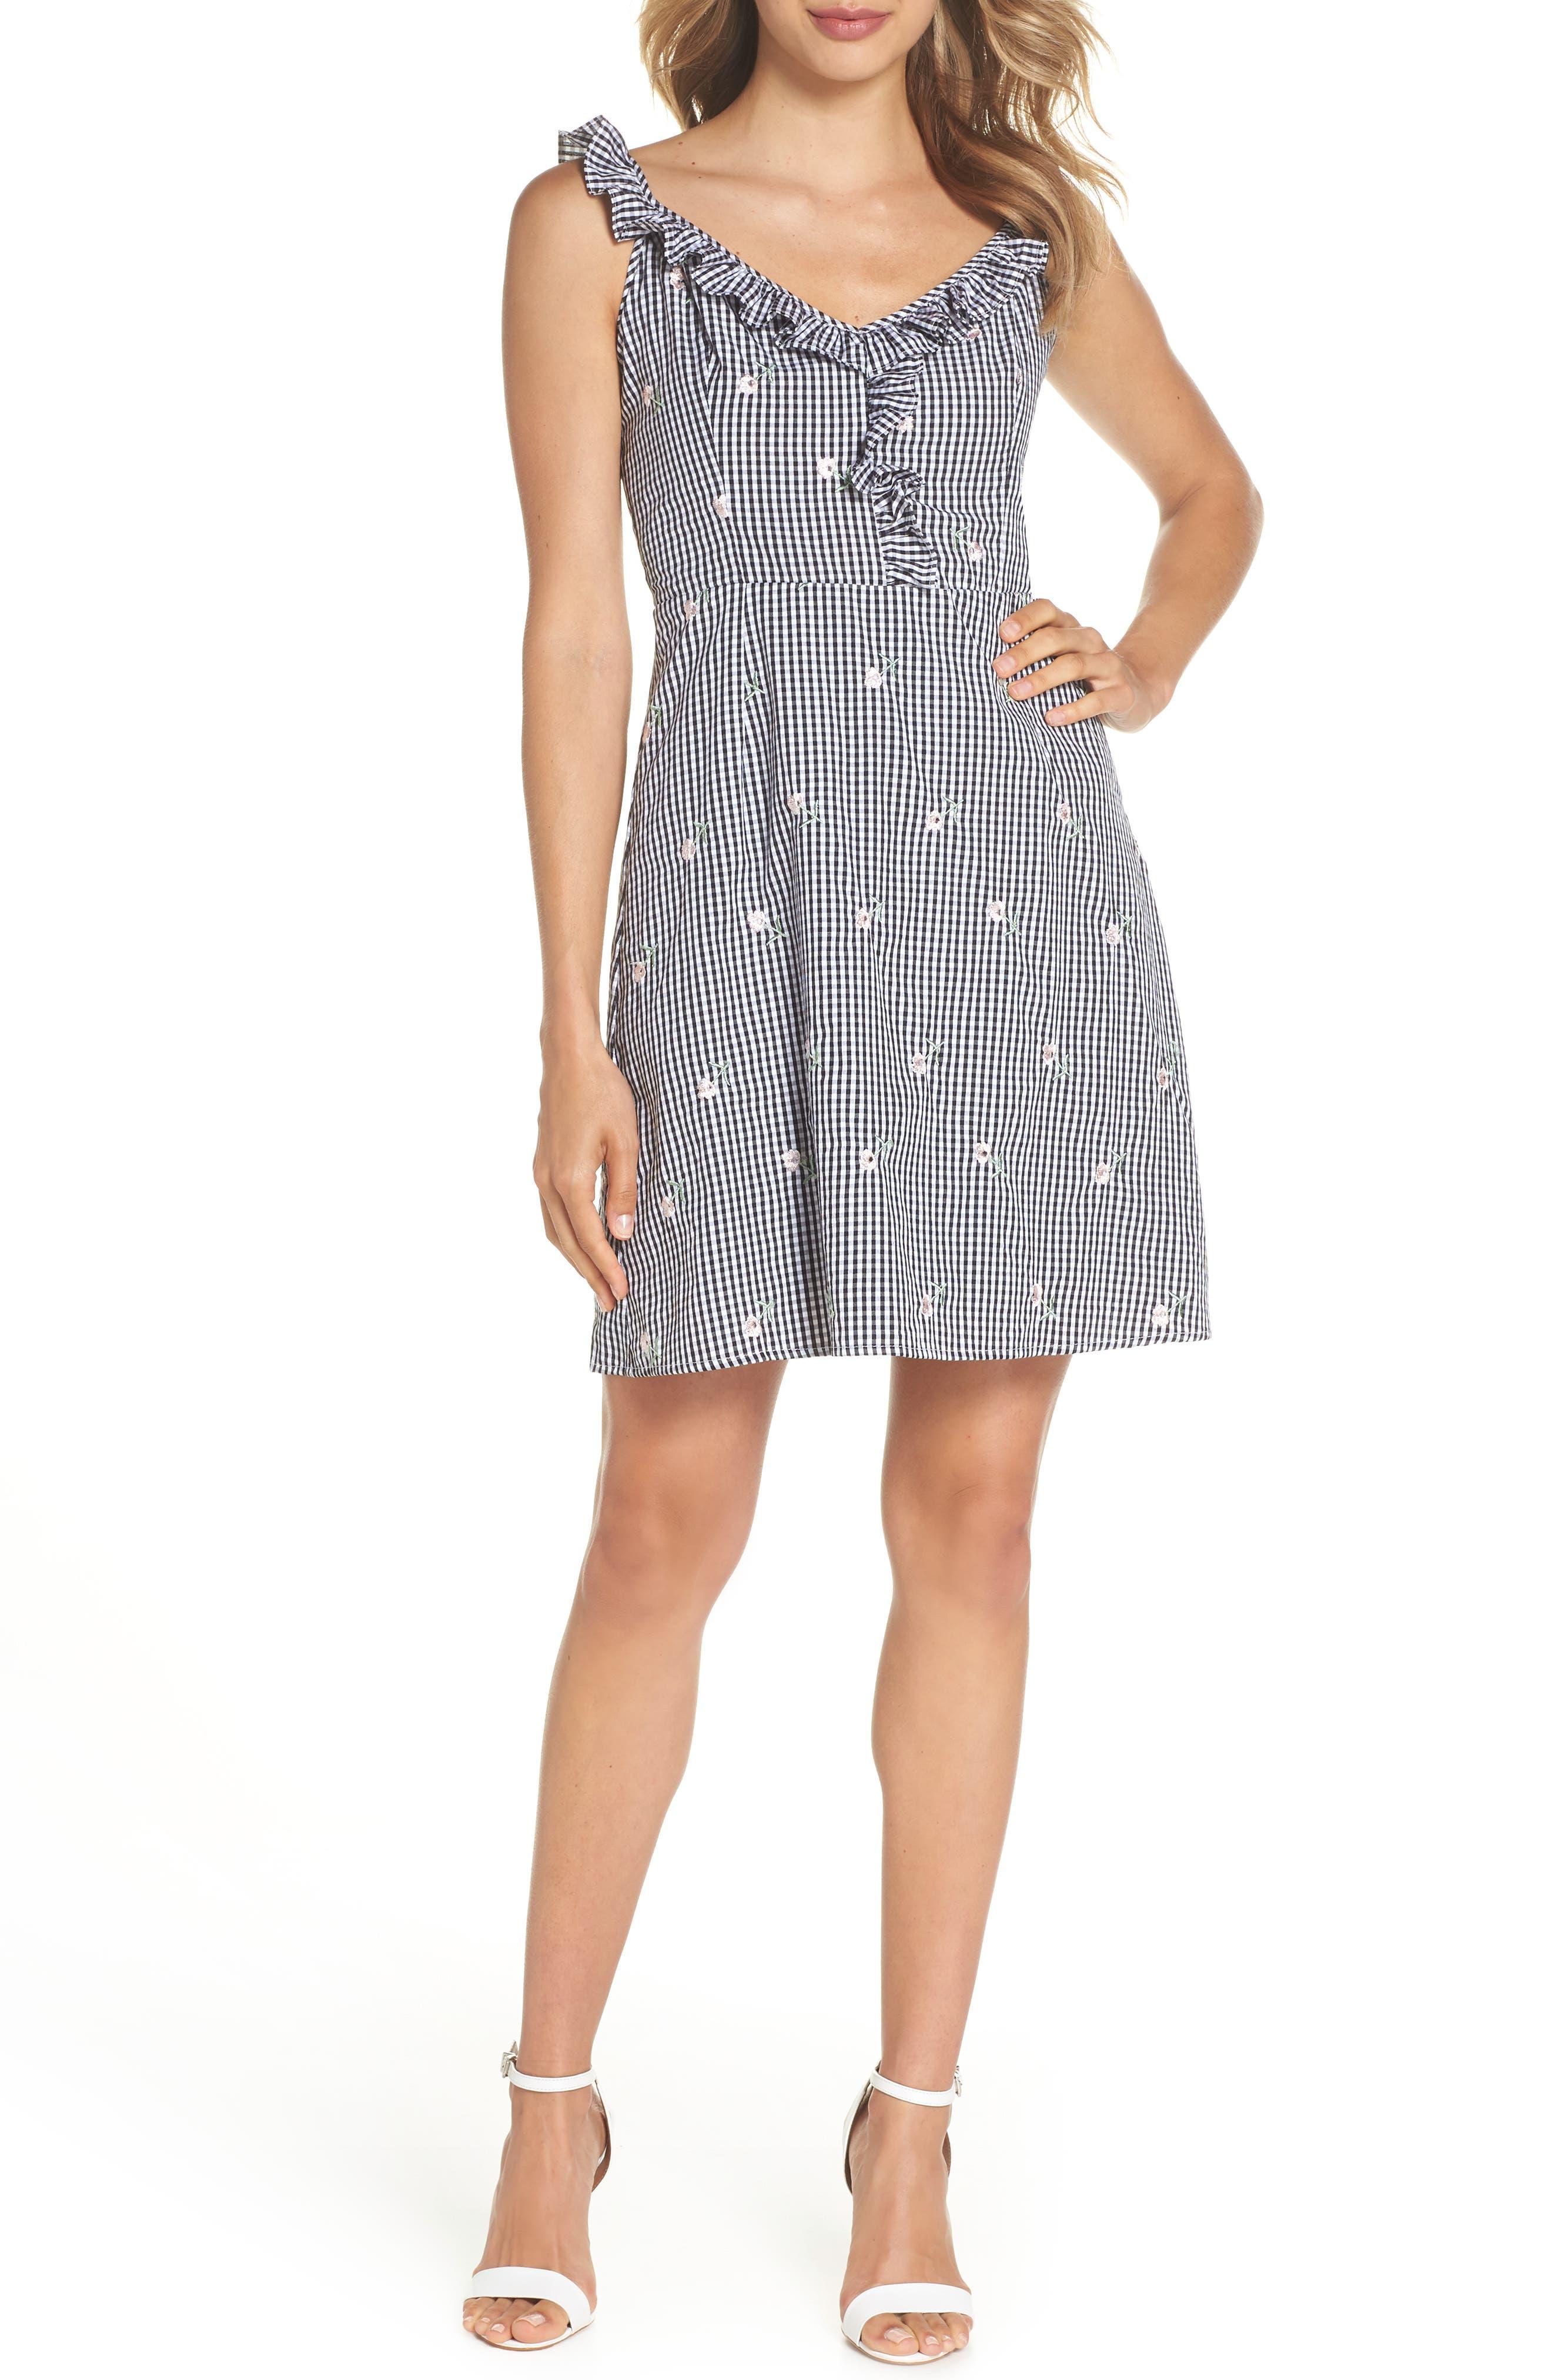 Jilly A-Line Cotton Dress,                             Main thumbnail 1, color,                             Multi